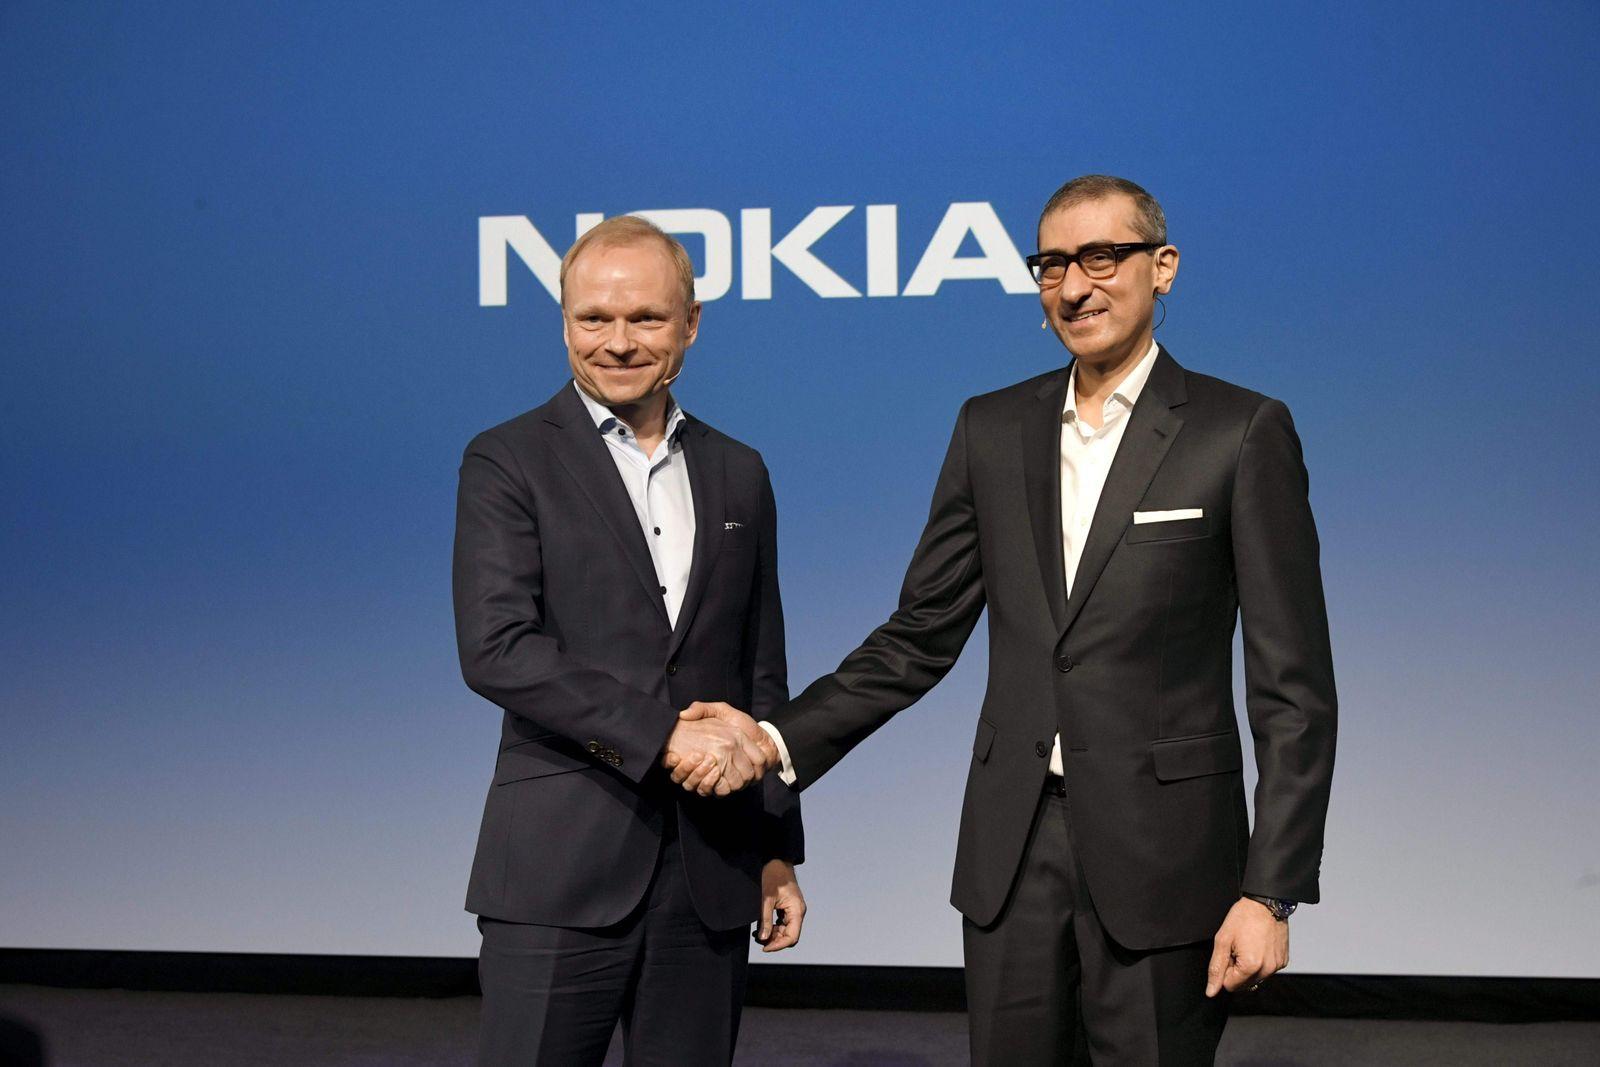 Nokia / Pekka Lundmark / Rajeev Suri